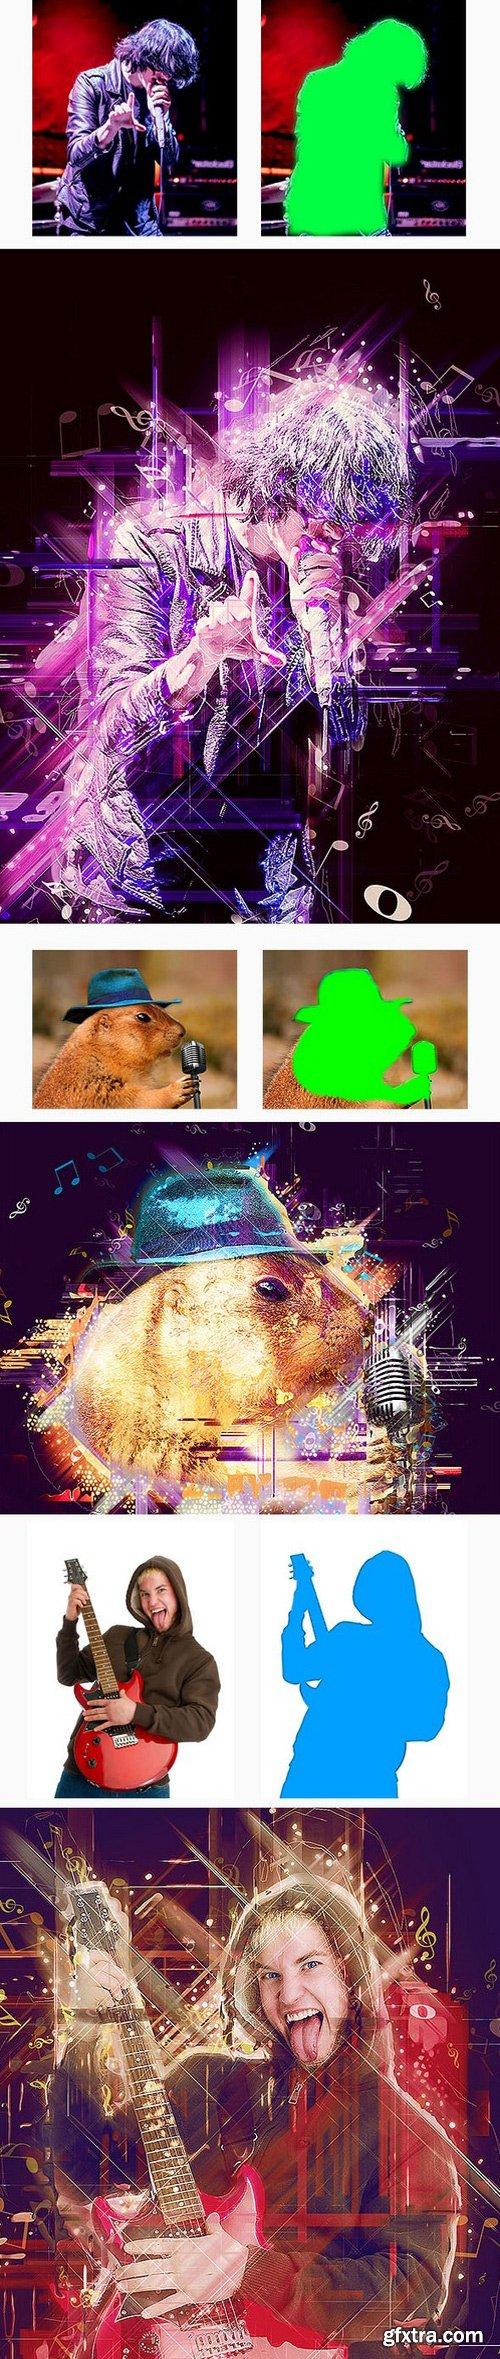 Graphicriver - Music Photoshop Action 17296287